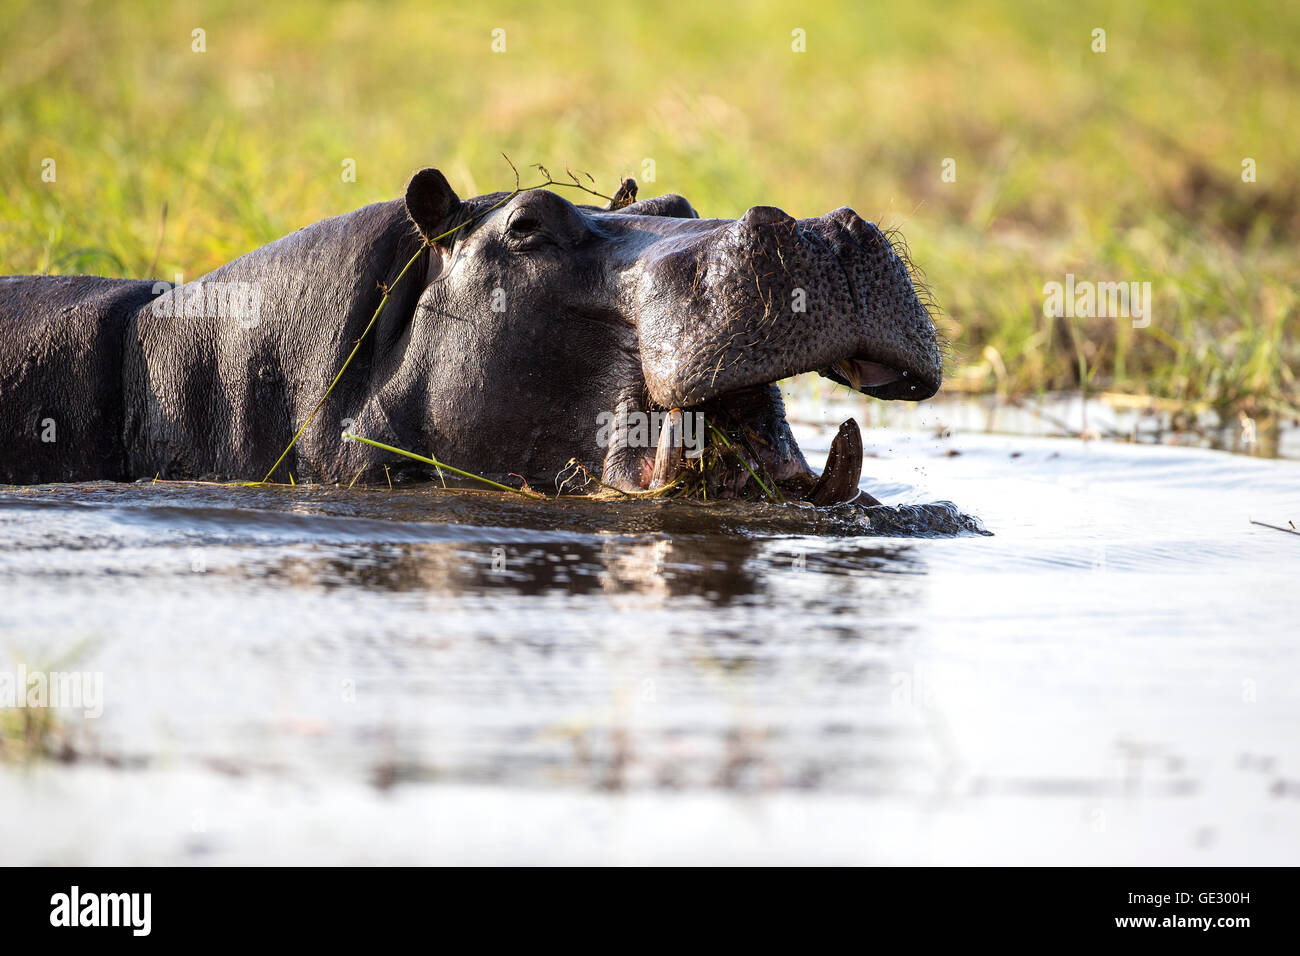 Large adult Hippopotamus Hippopotamus amphibius semi submerged with open mouth showing large canine tusks - Stock Image